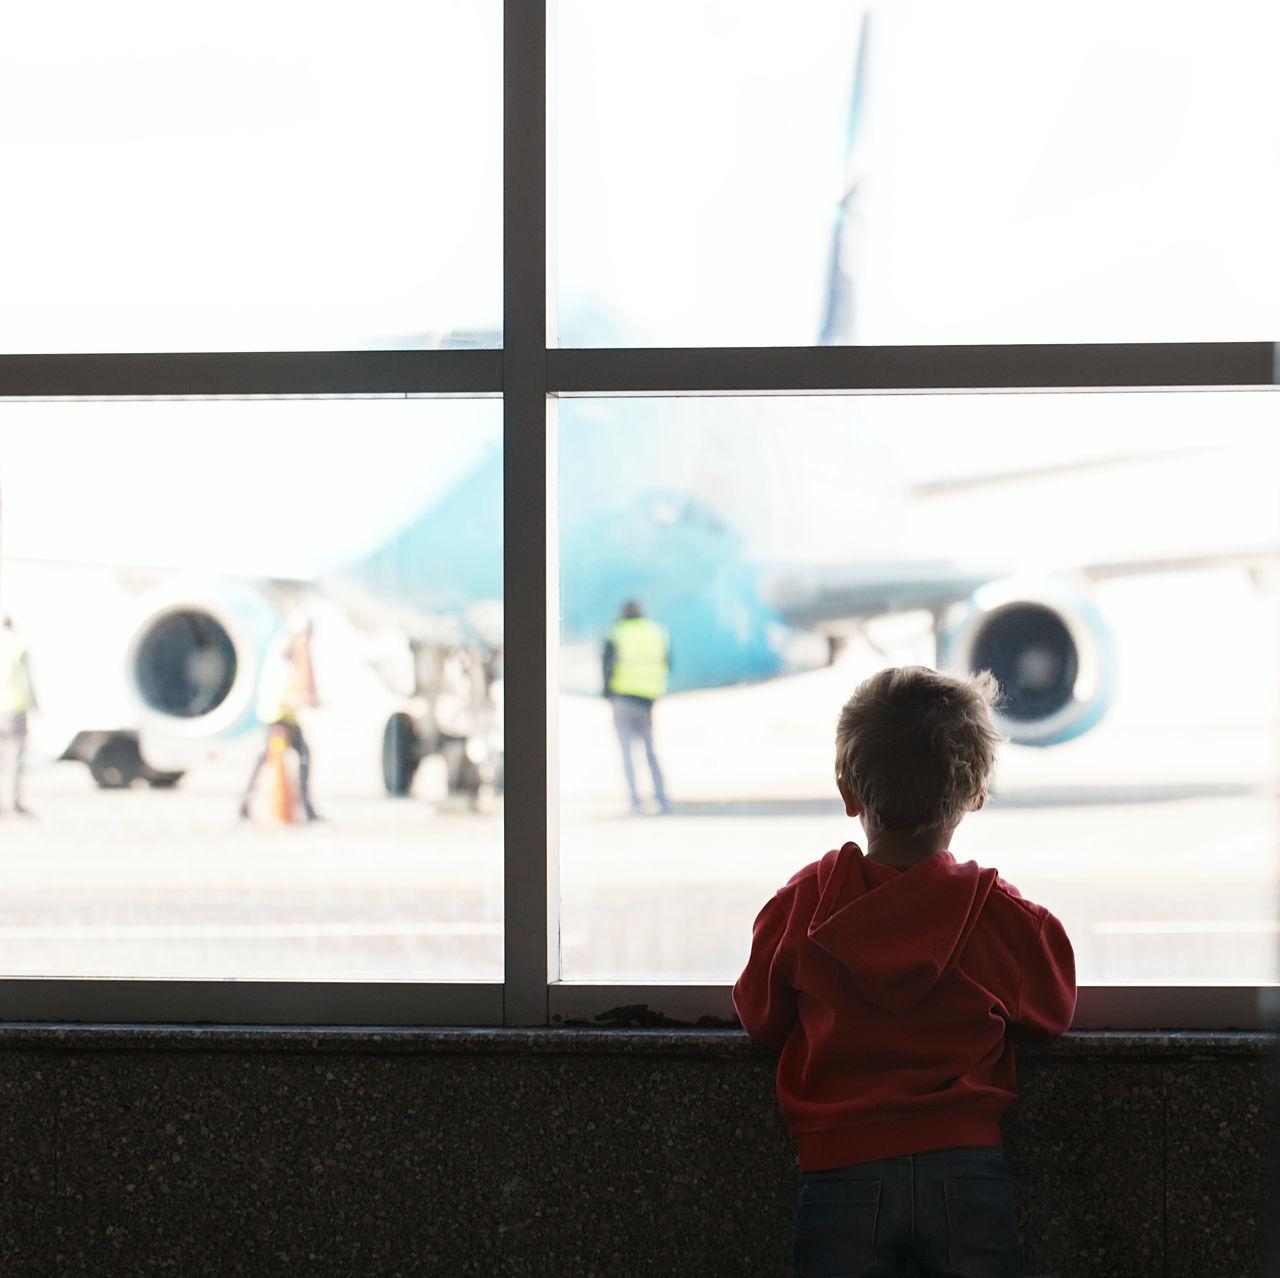 Beautiful stock photos of kids, rear view, transportation, airport, travel